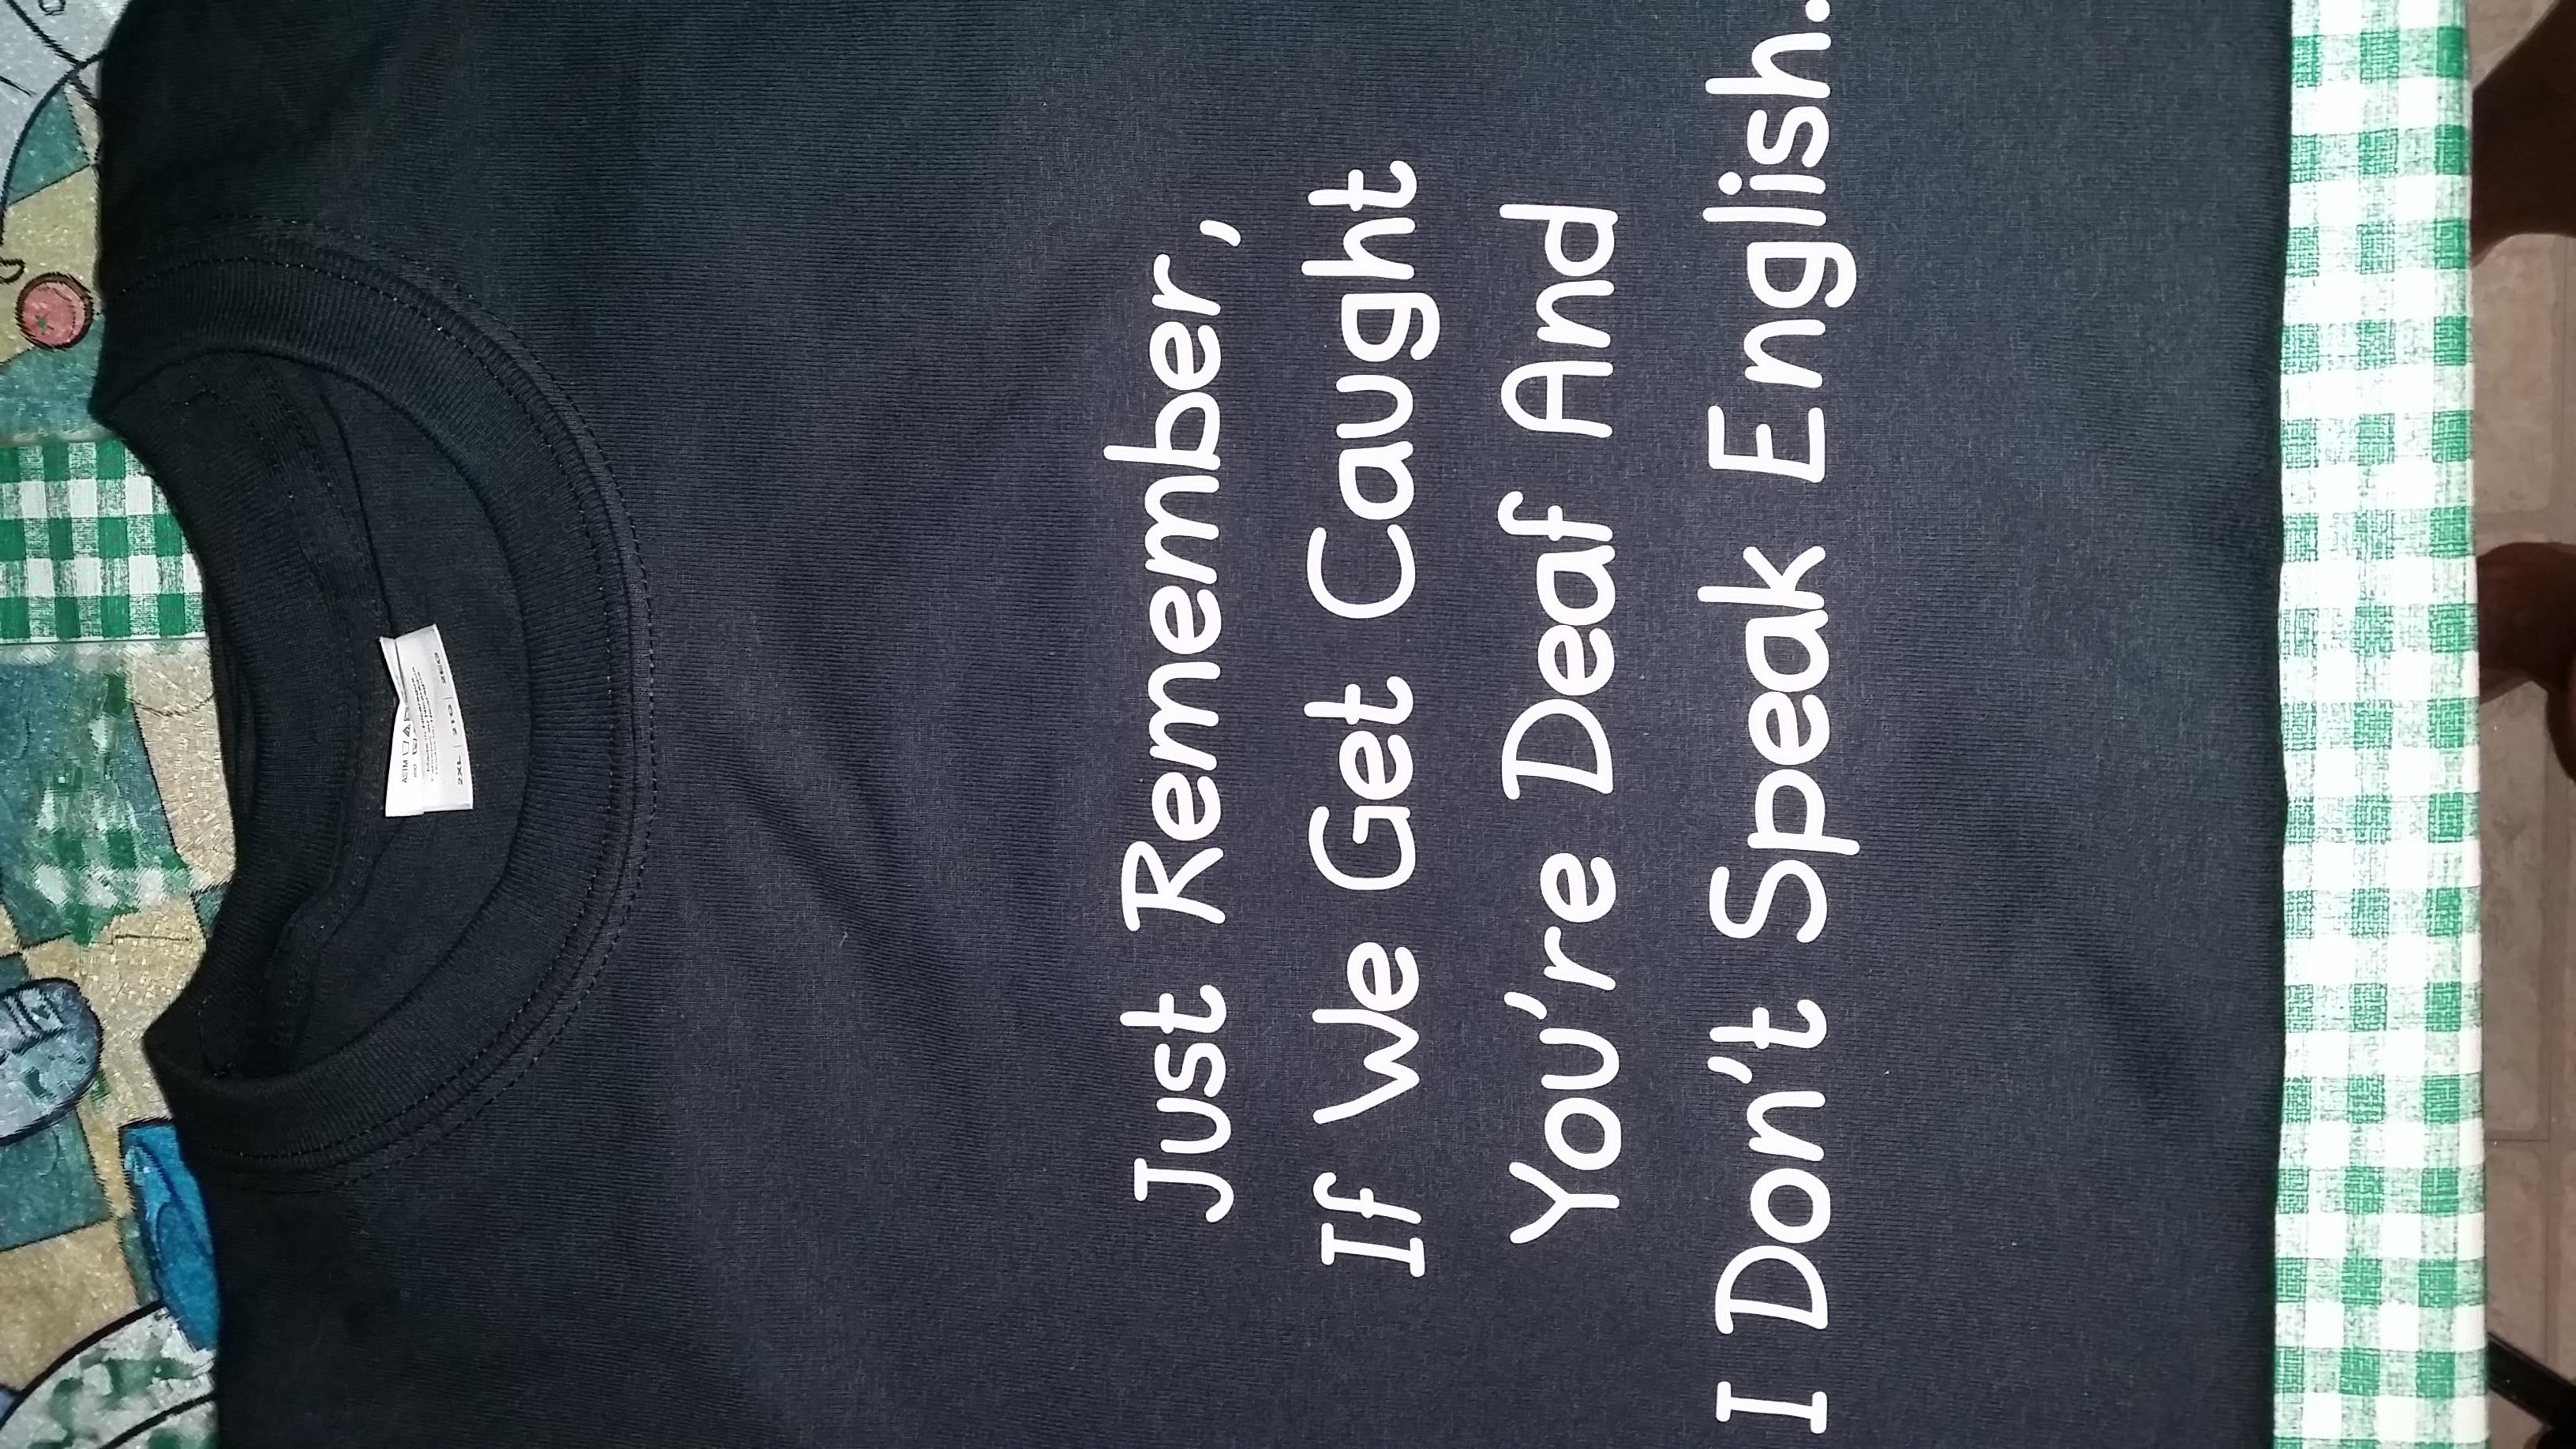 Gildan cotton t-shirts